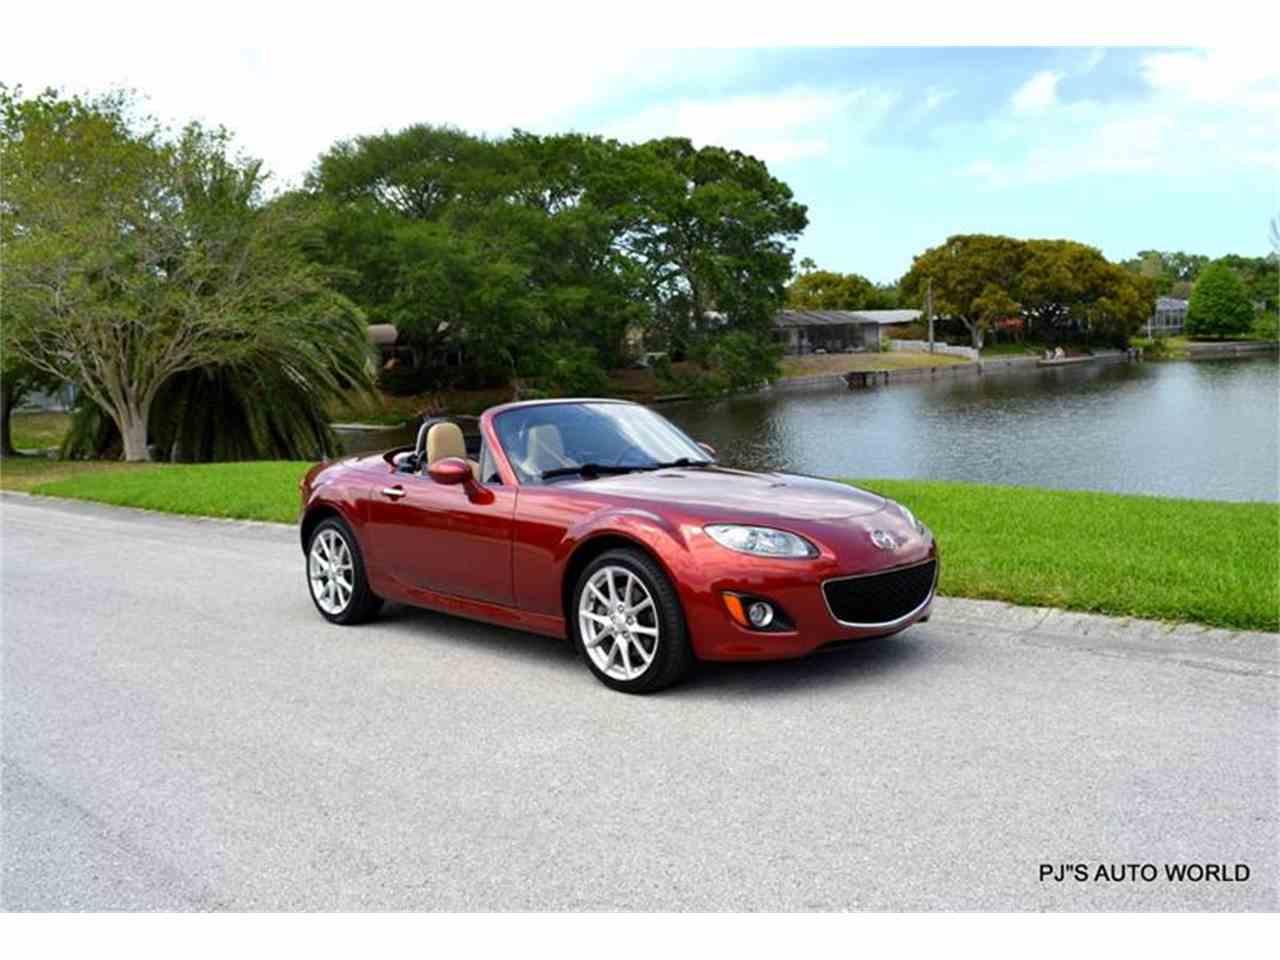 Large Picture of '12 Mazda Miata - $16,600.00 - L6IJ